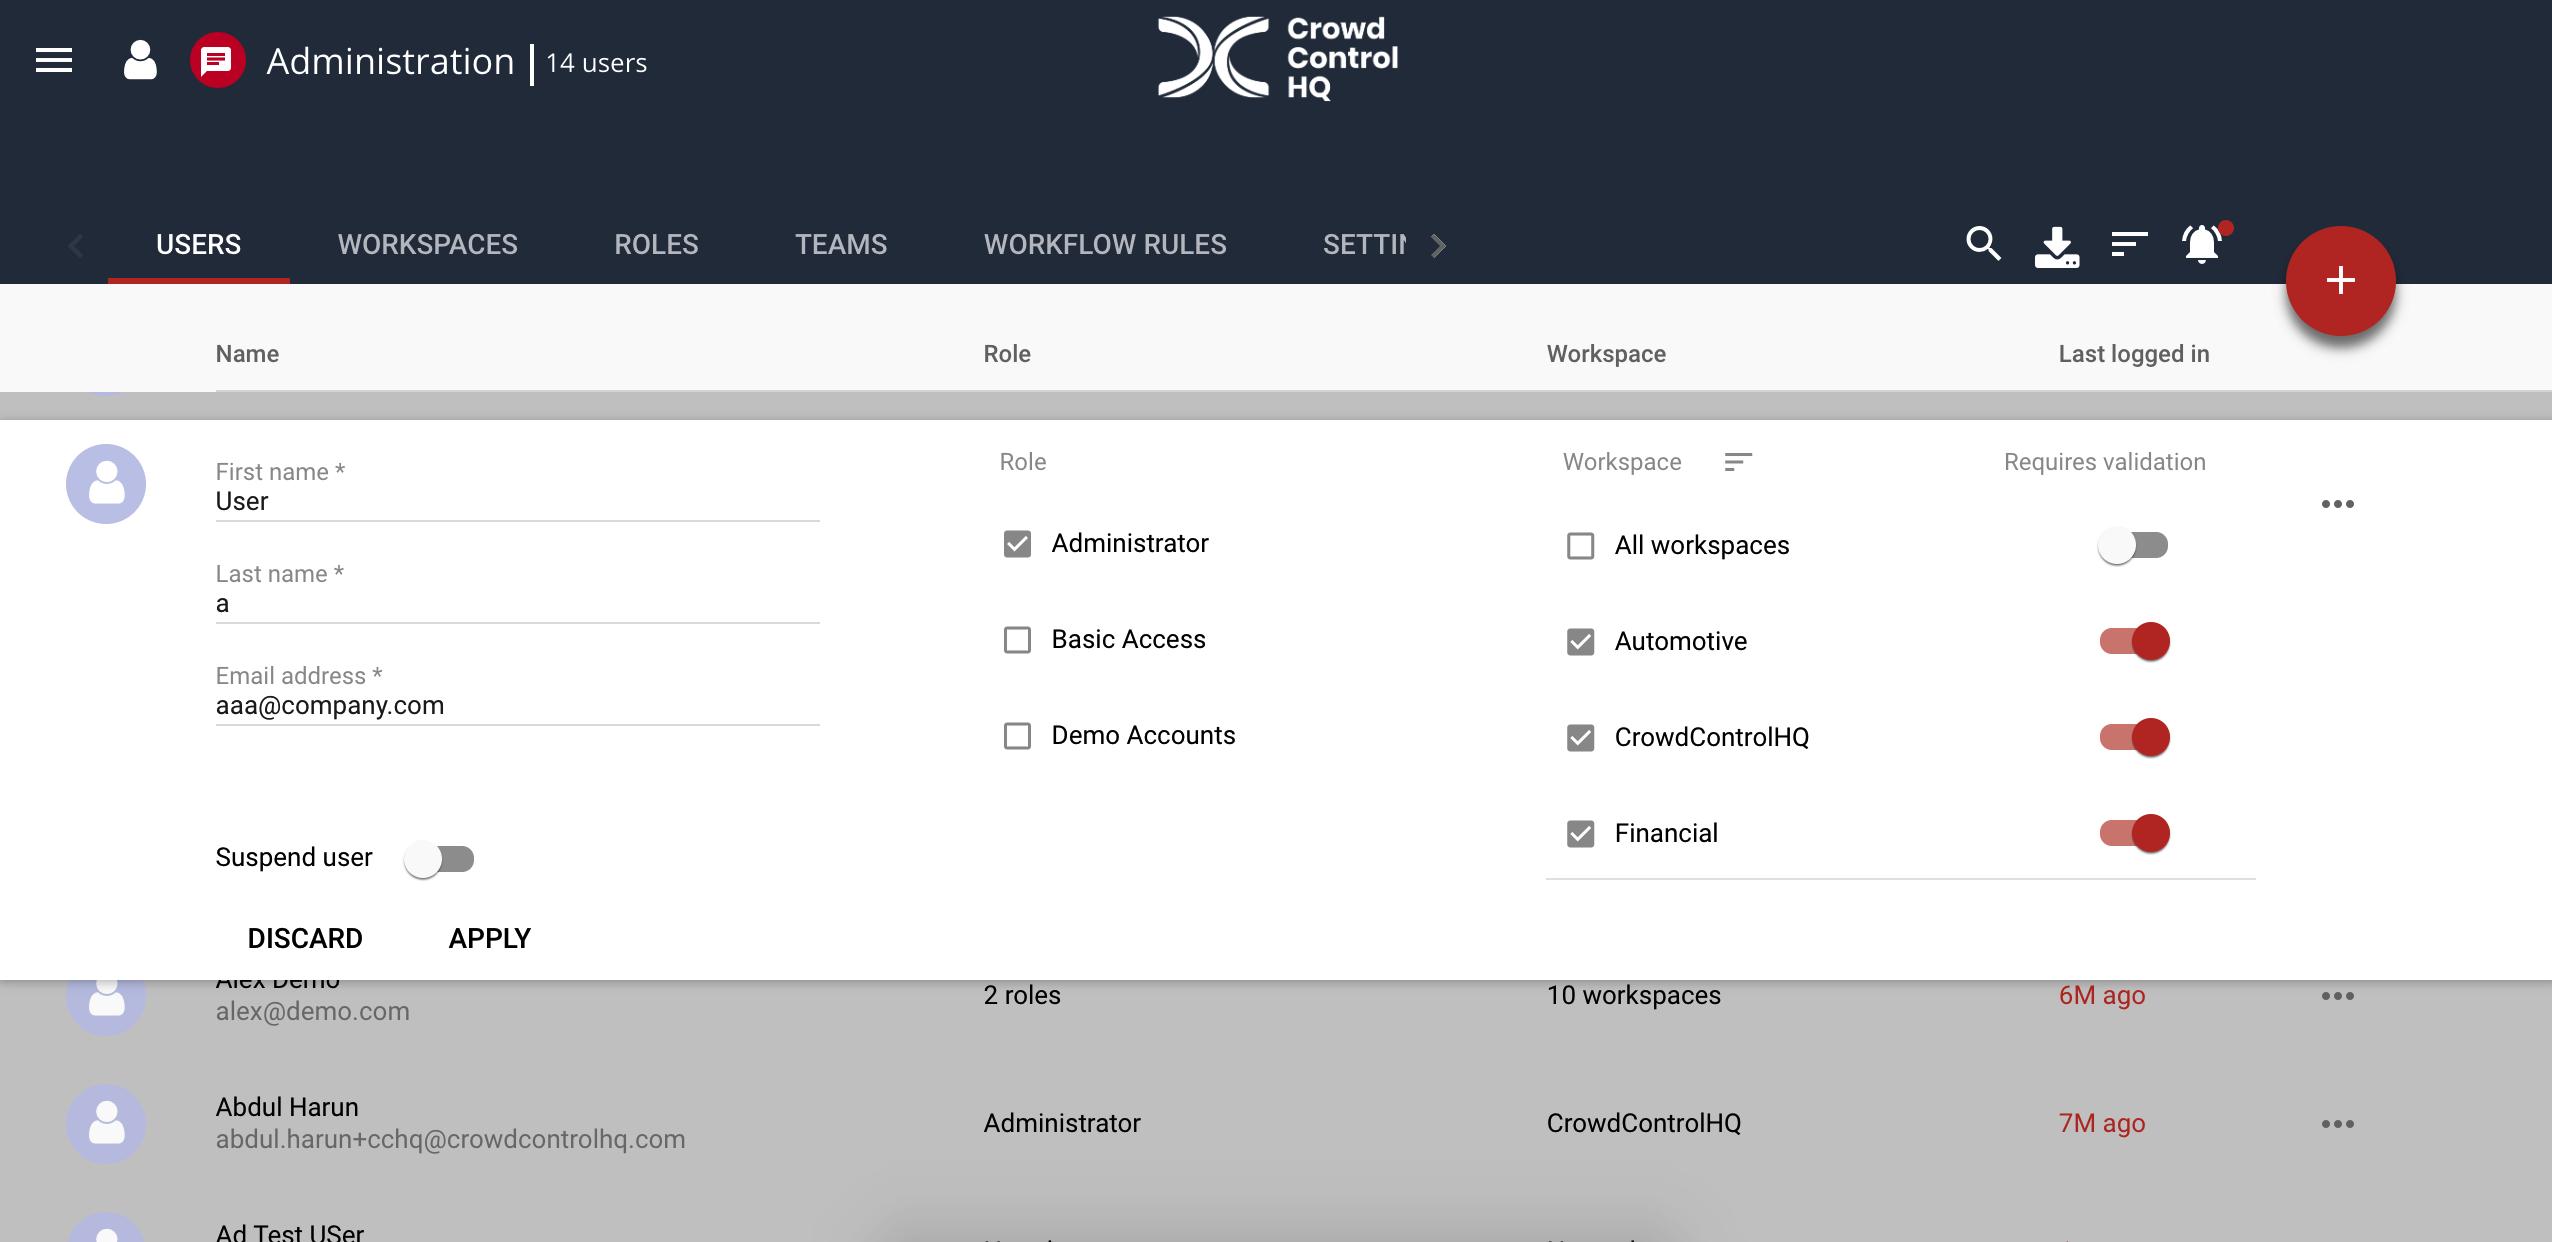 Individual user logins through CrowdControlHQ